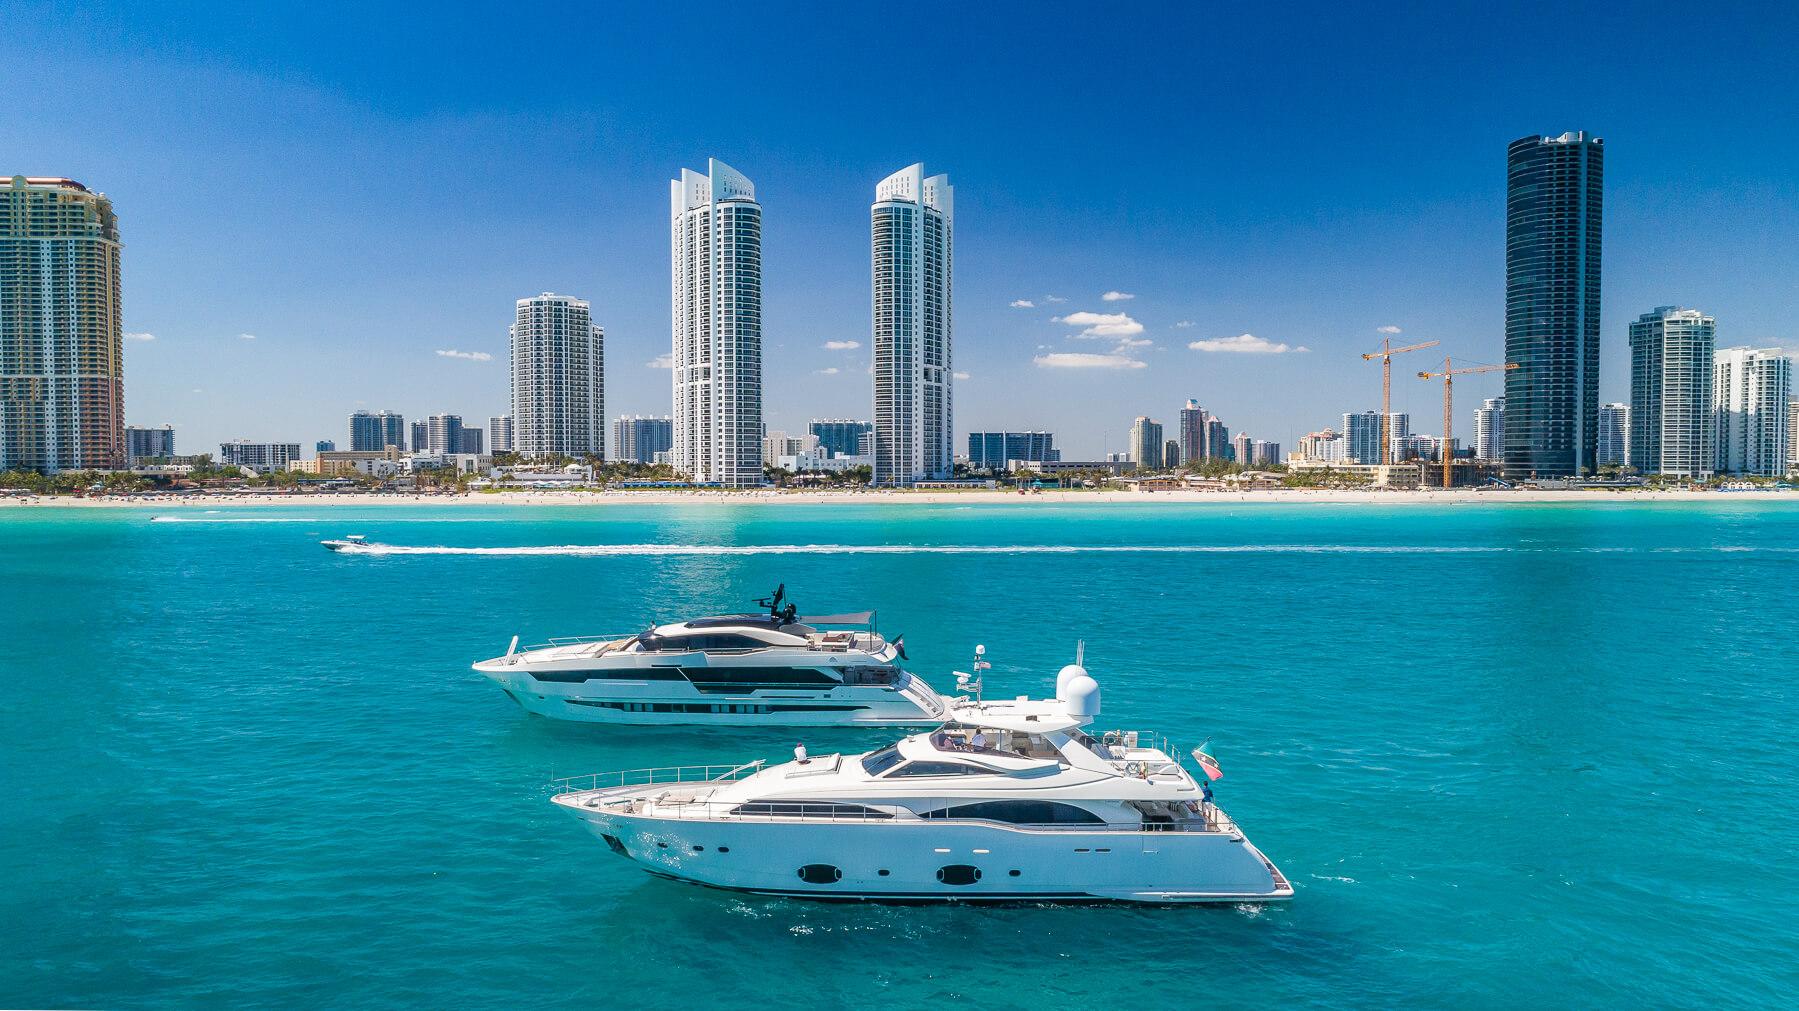 gyc yachts